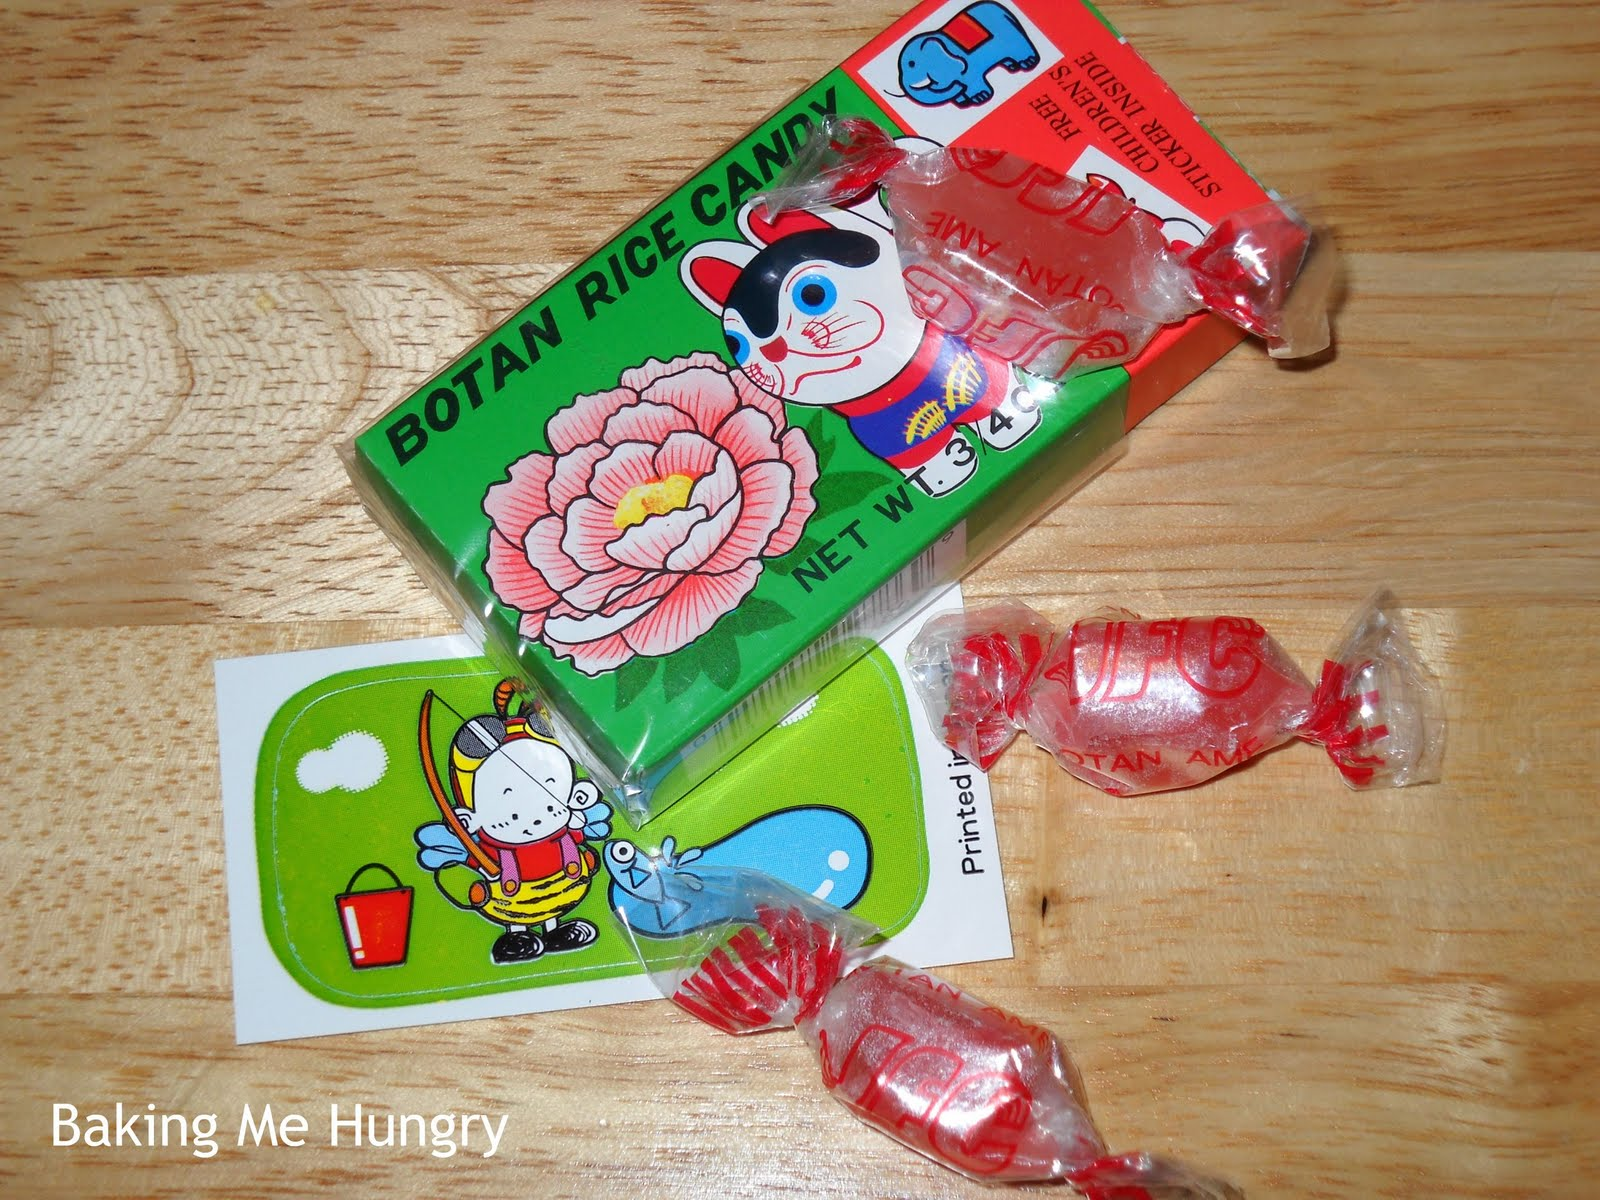 Permen botan rice candy